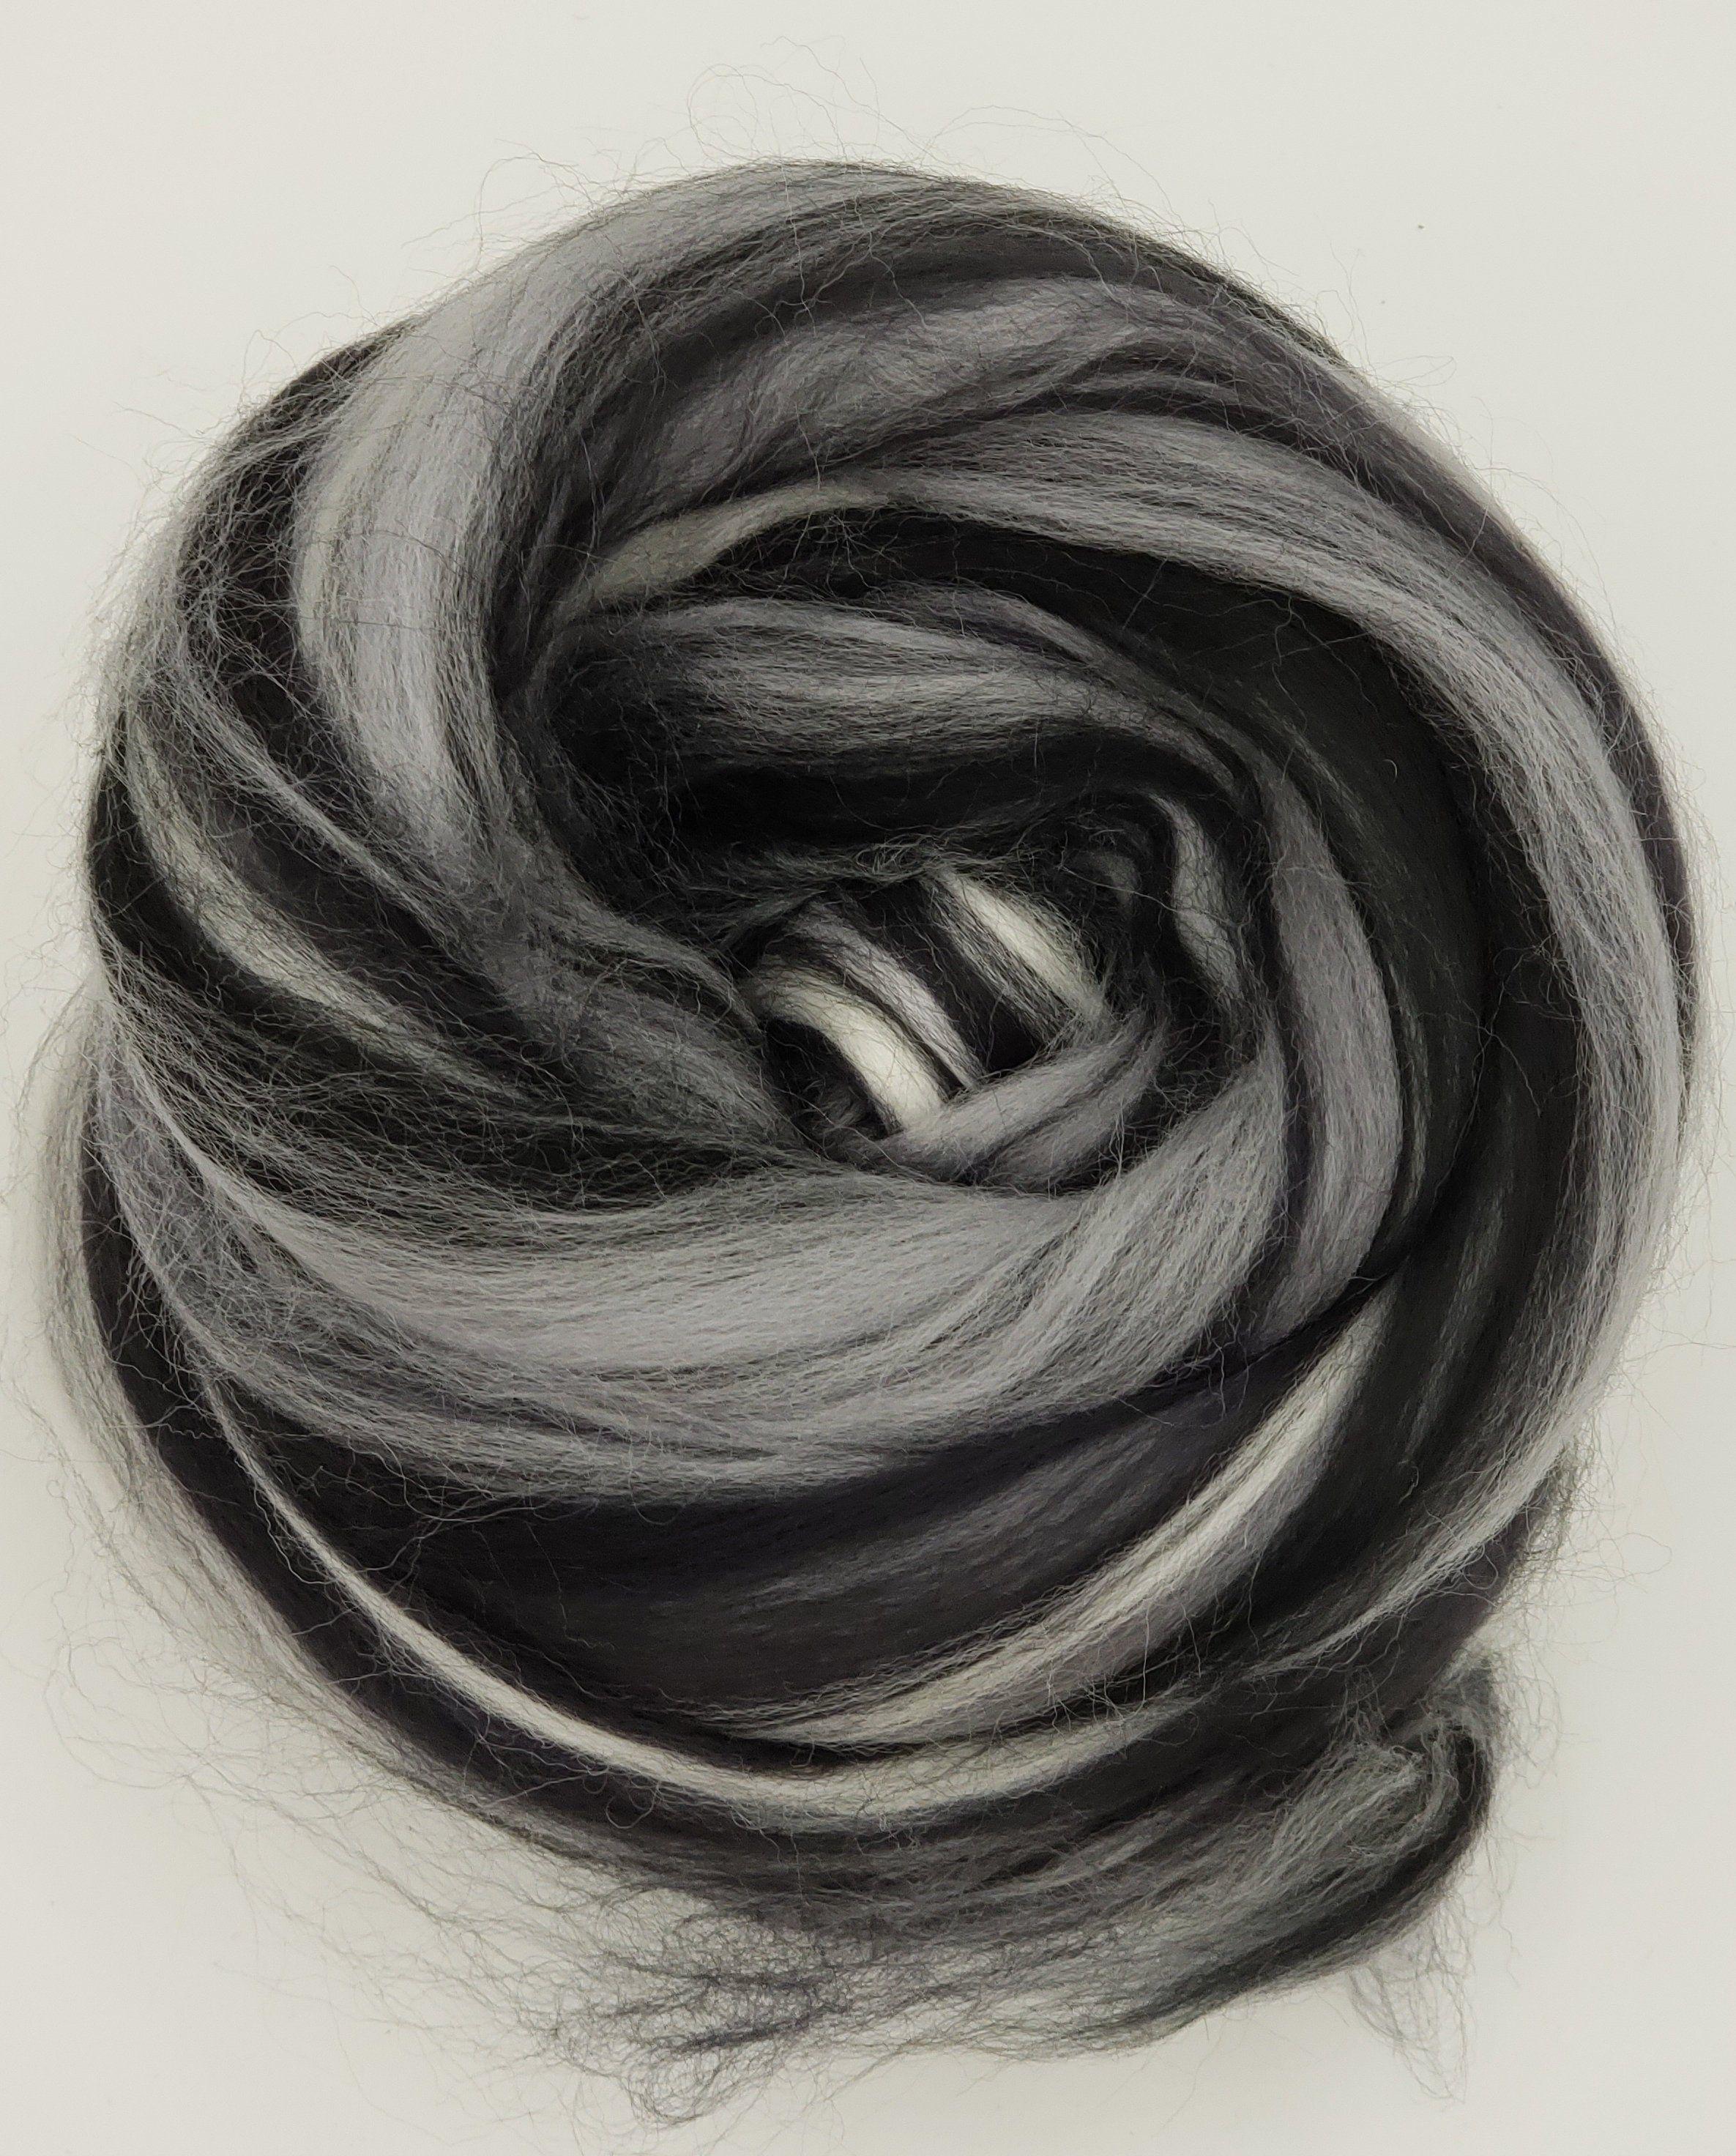 23 Micron Lightning Merino Wool Top